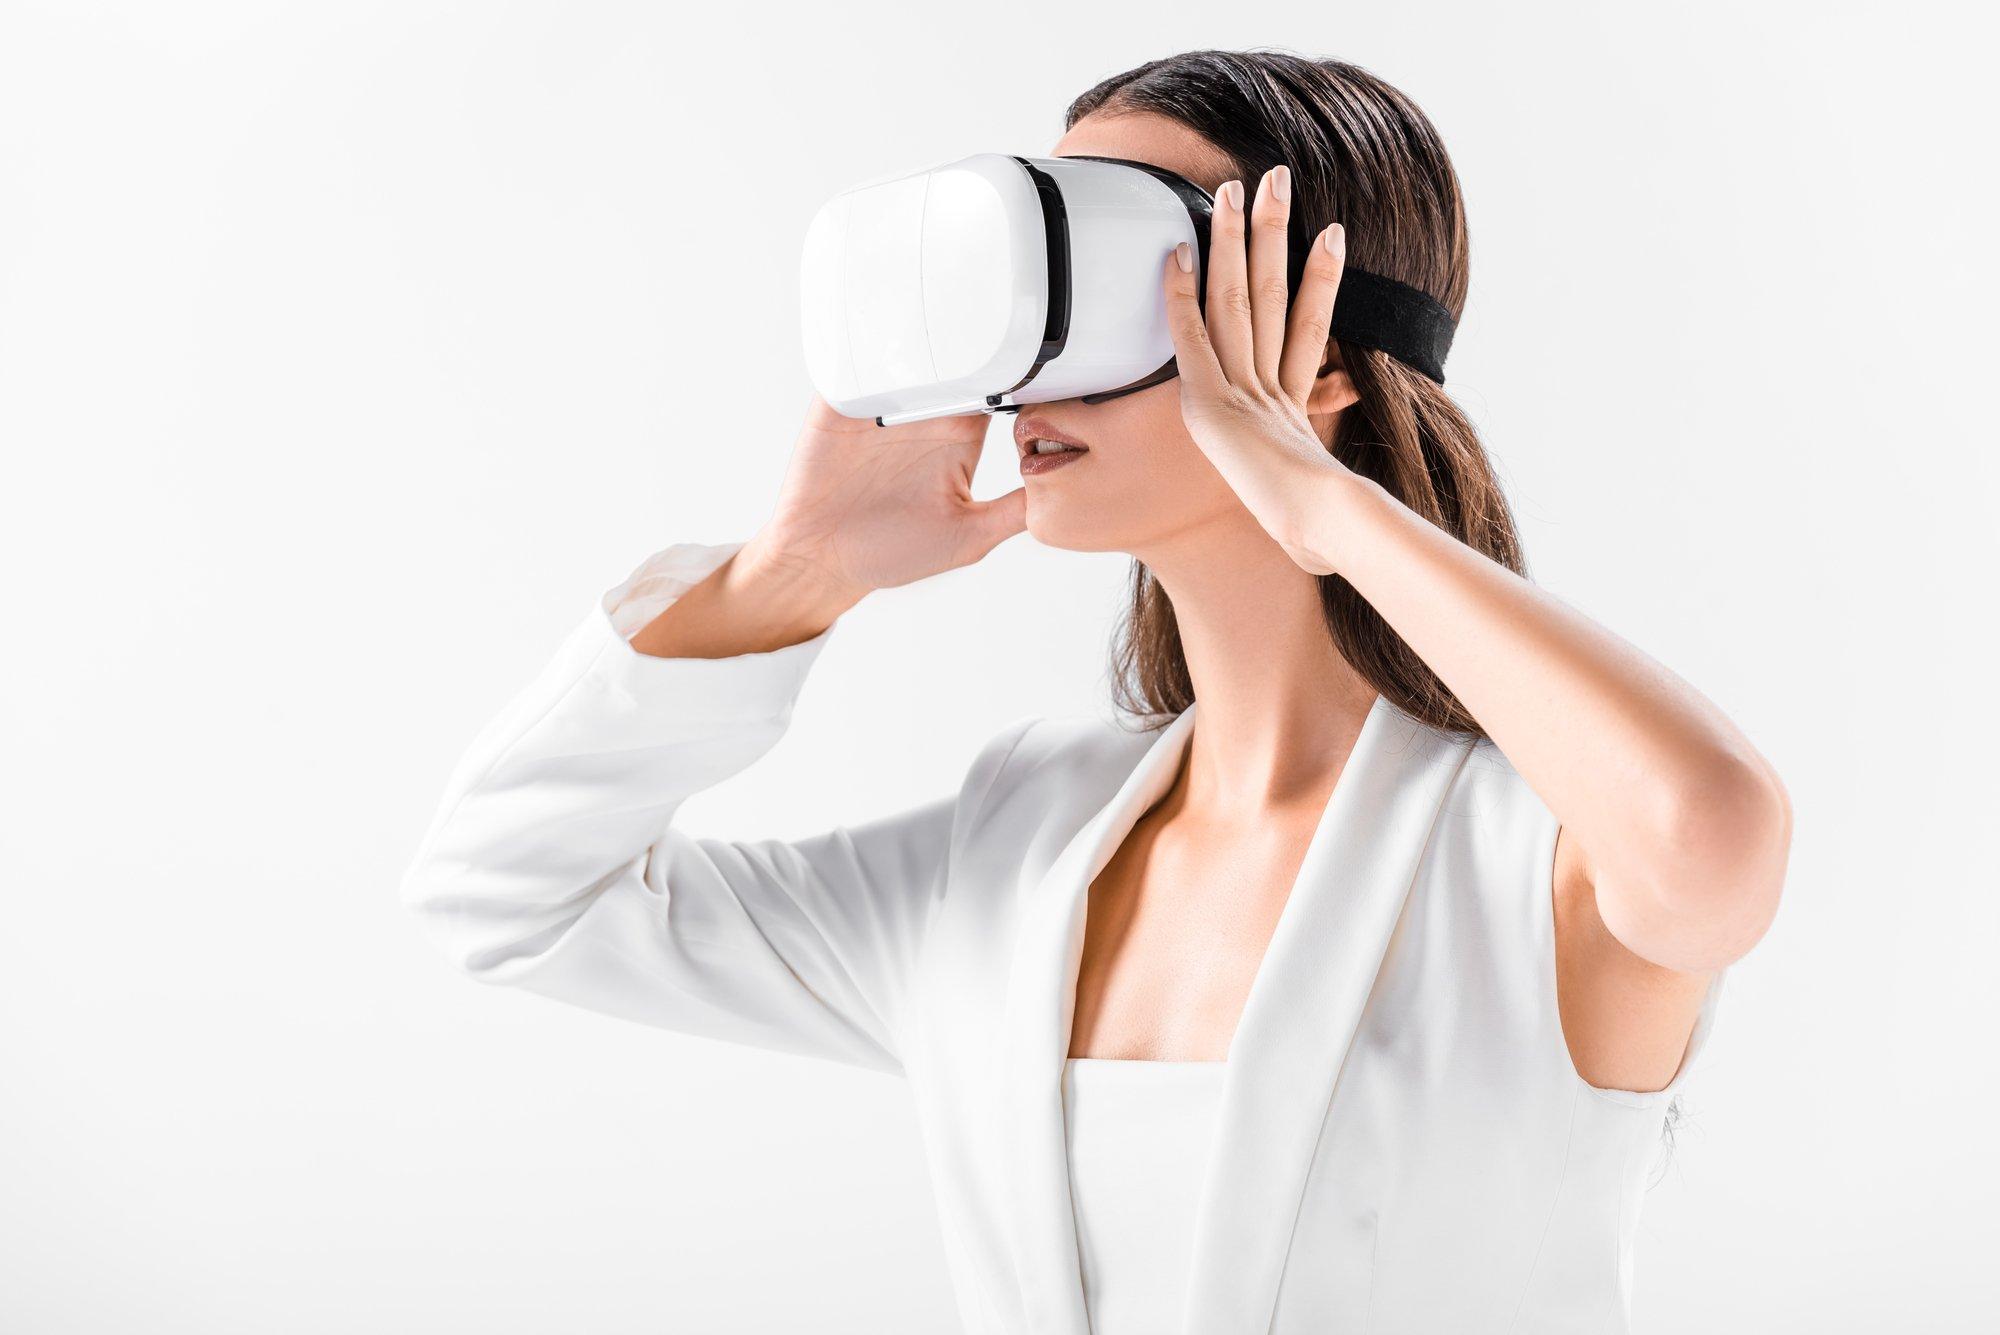 Apple's AR/VR headset concept